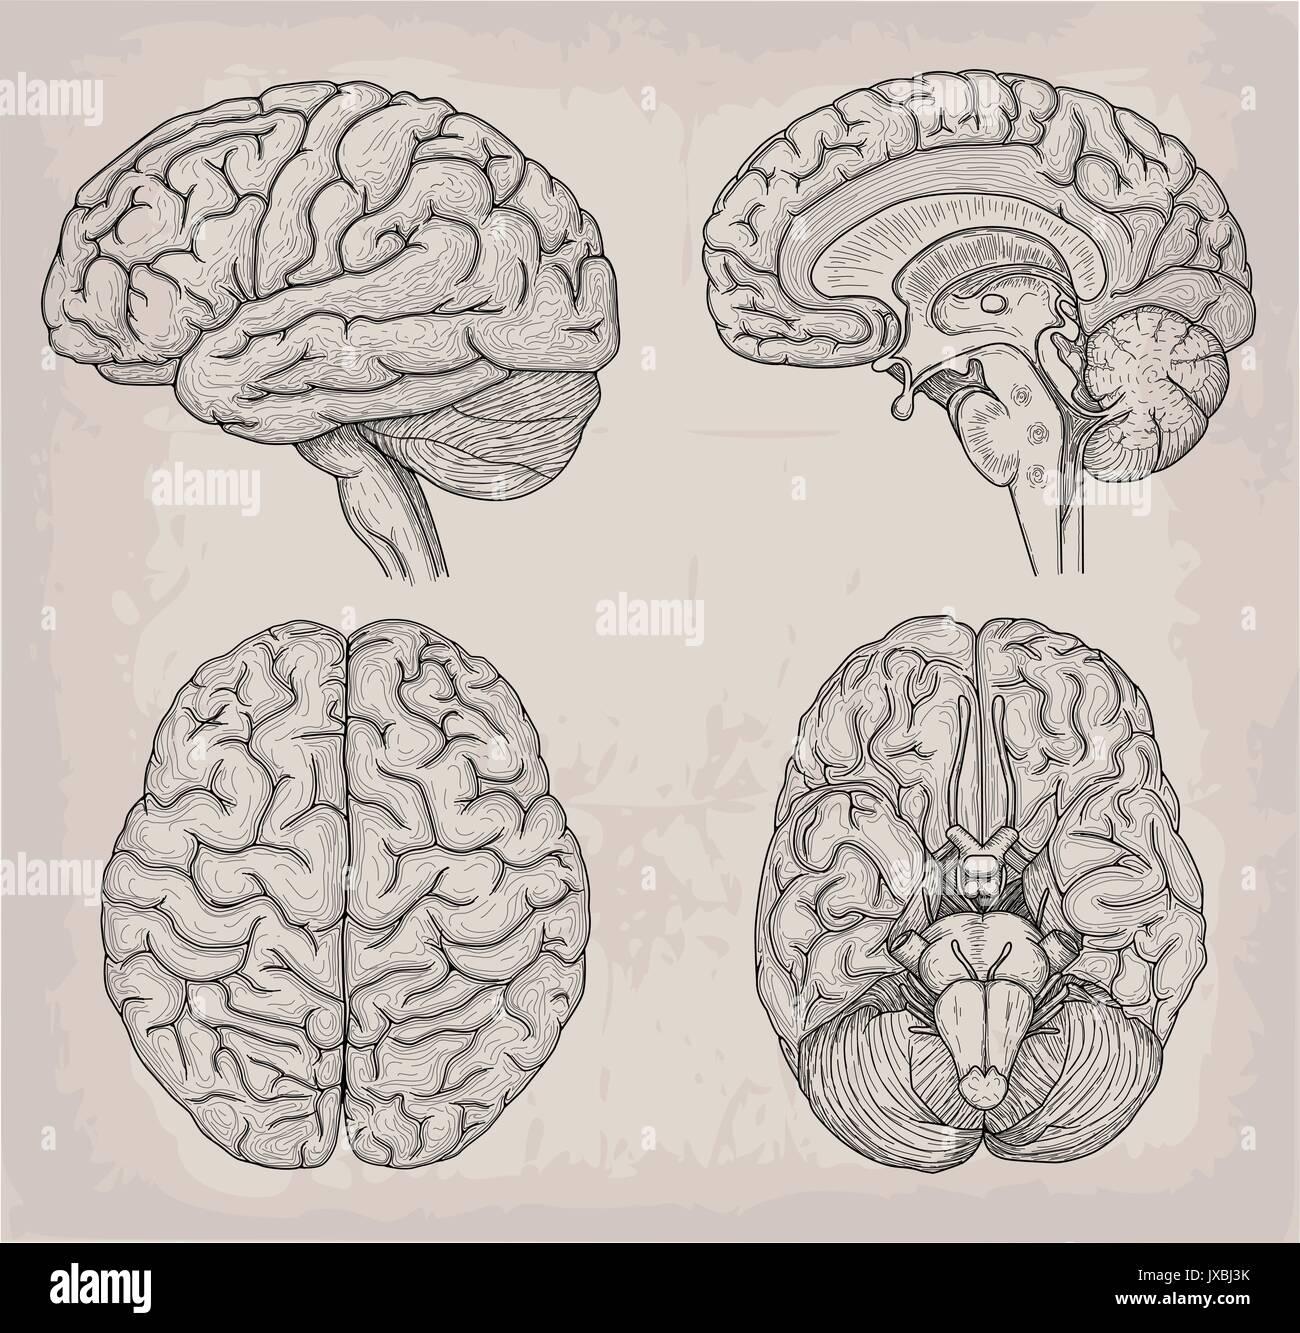 Anatomical Brain human illustration. Medicine, Vector illustration ...